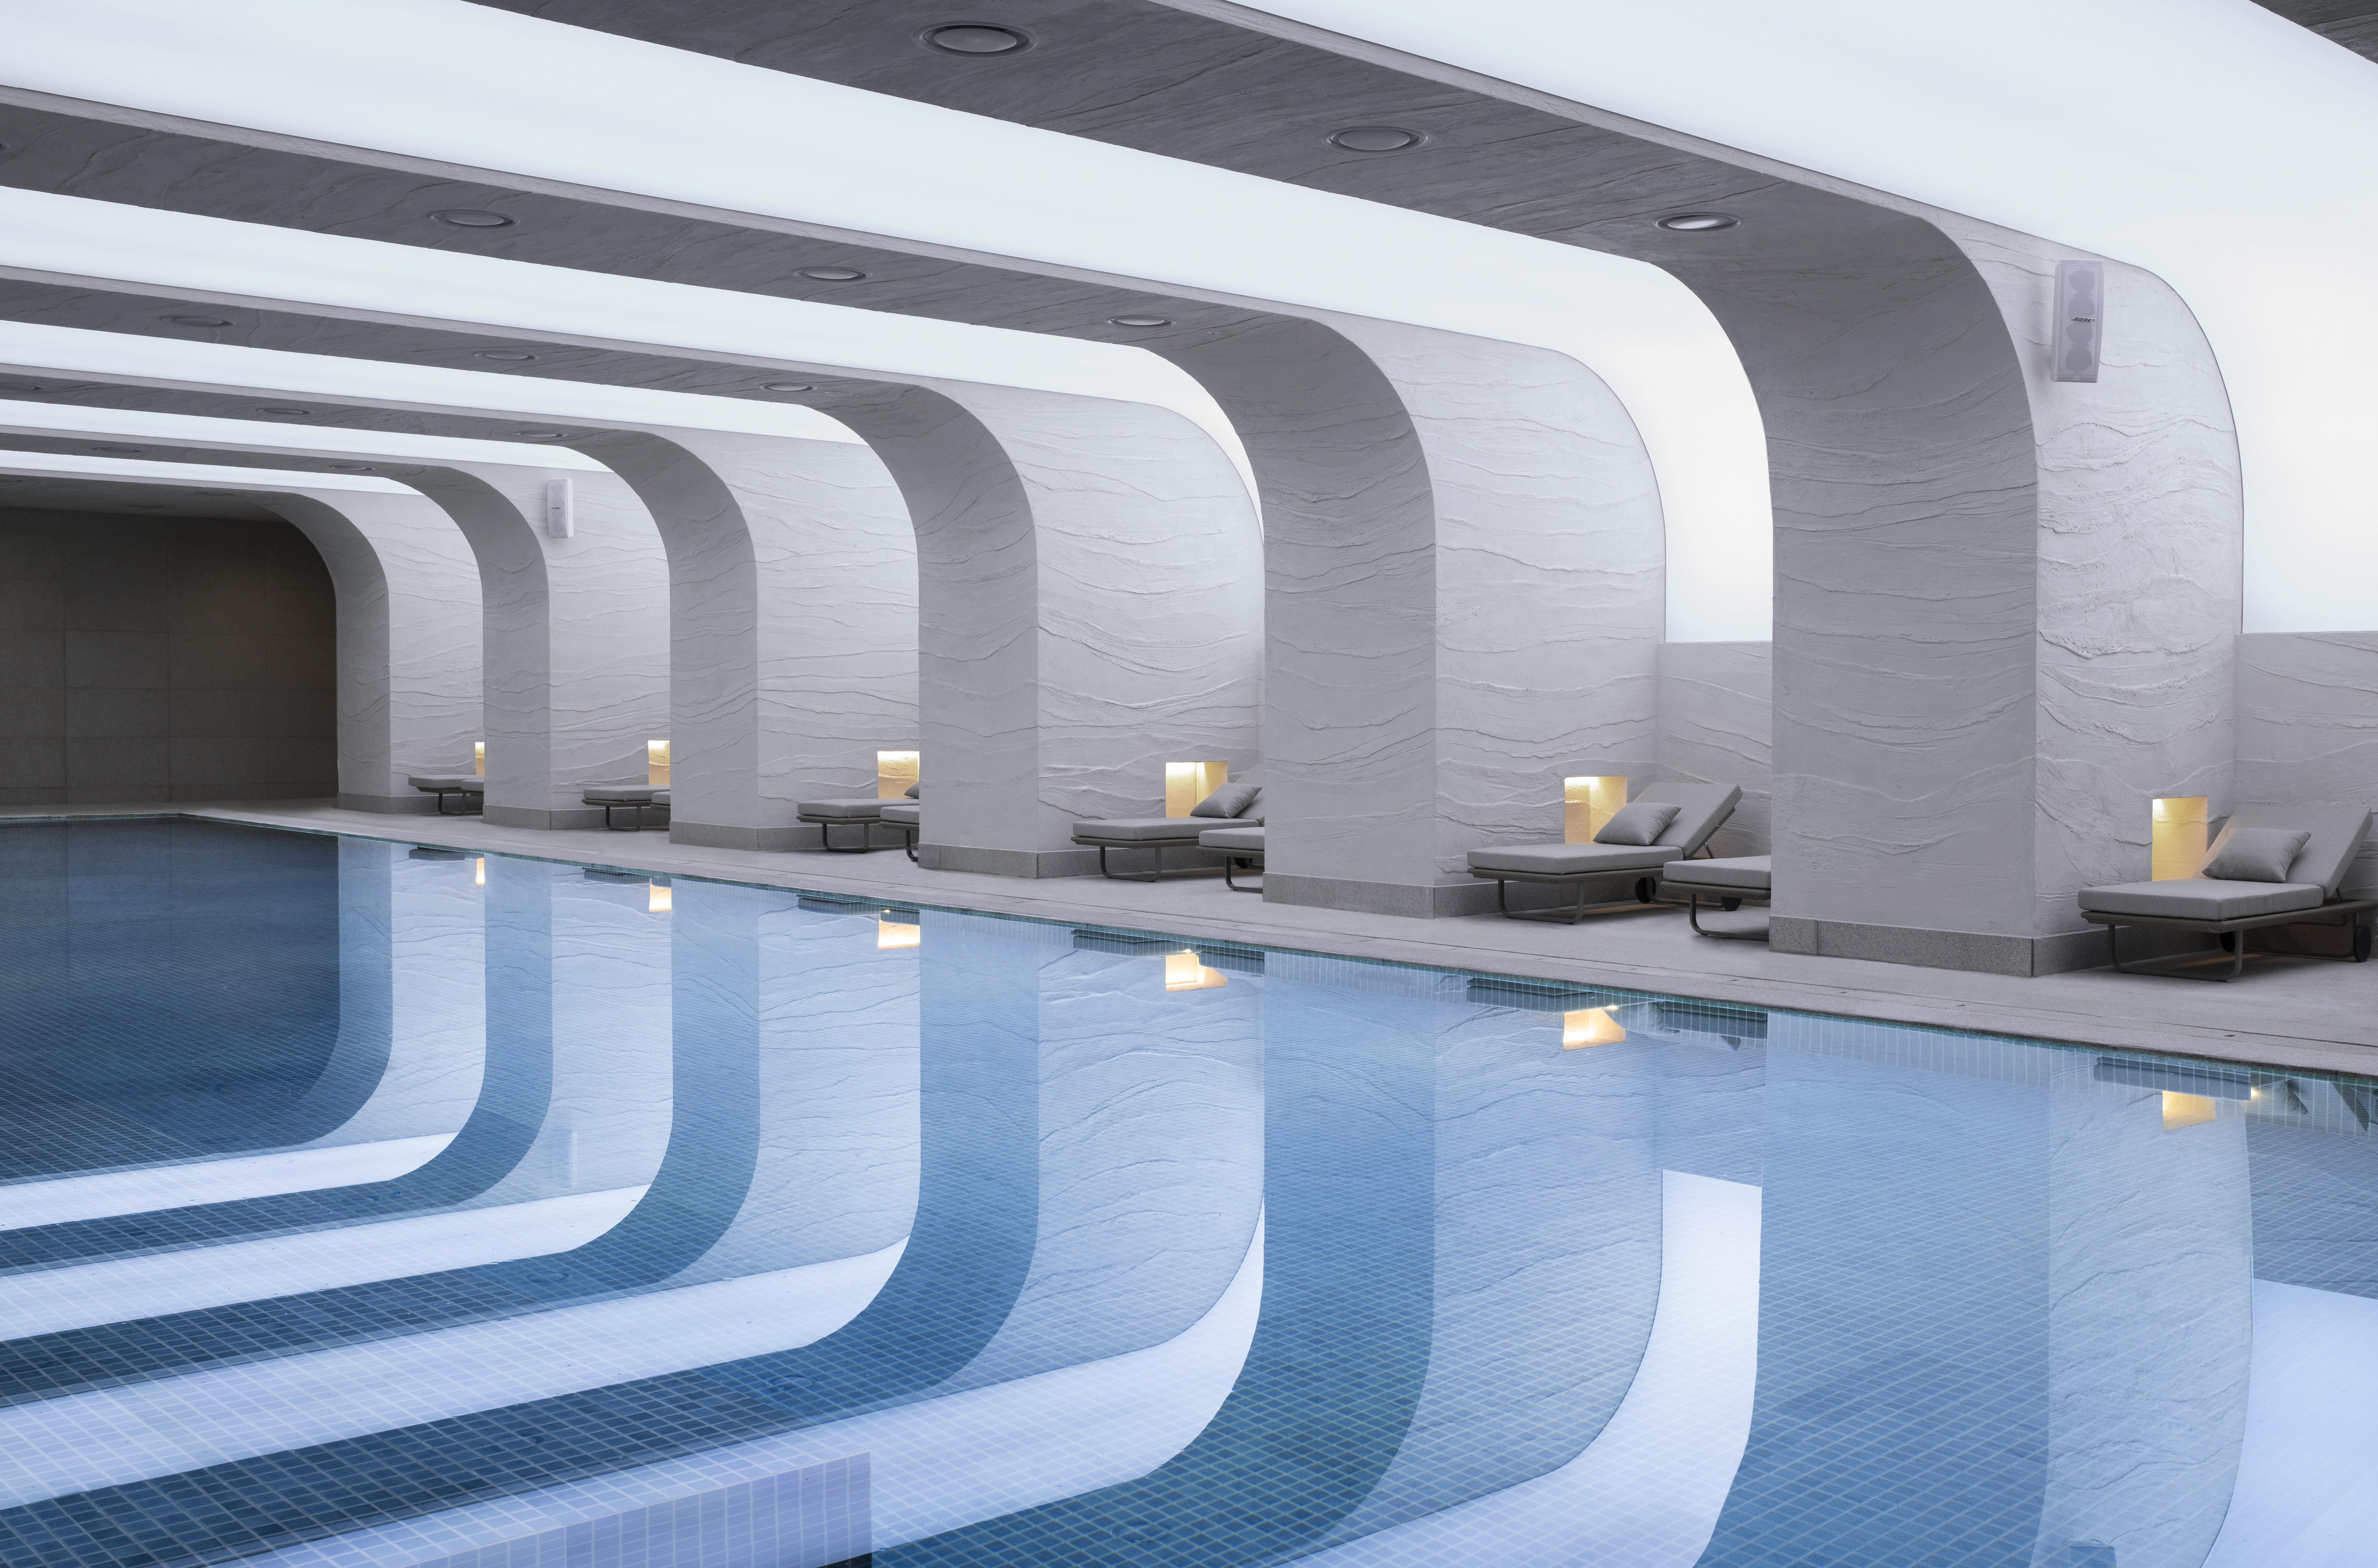 Mondrian Seoul ItaewonIndoor swimming pool-jpg